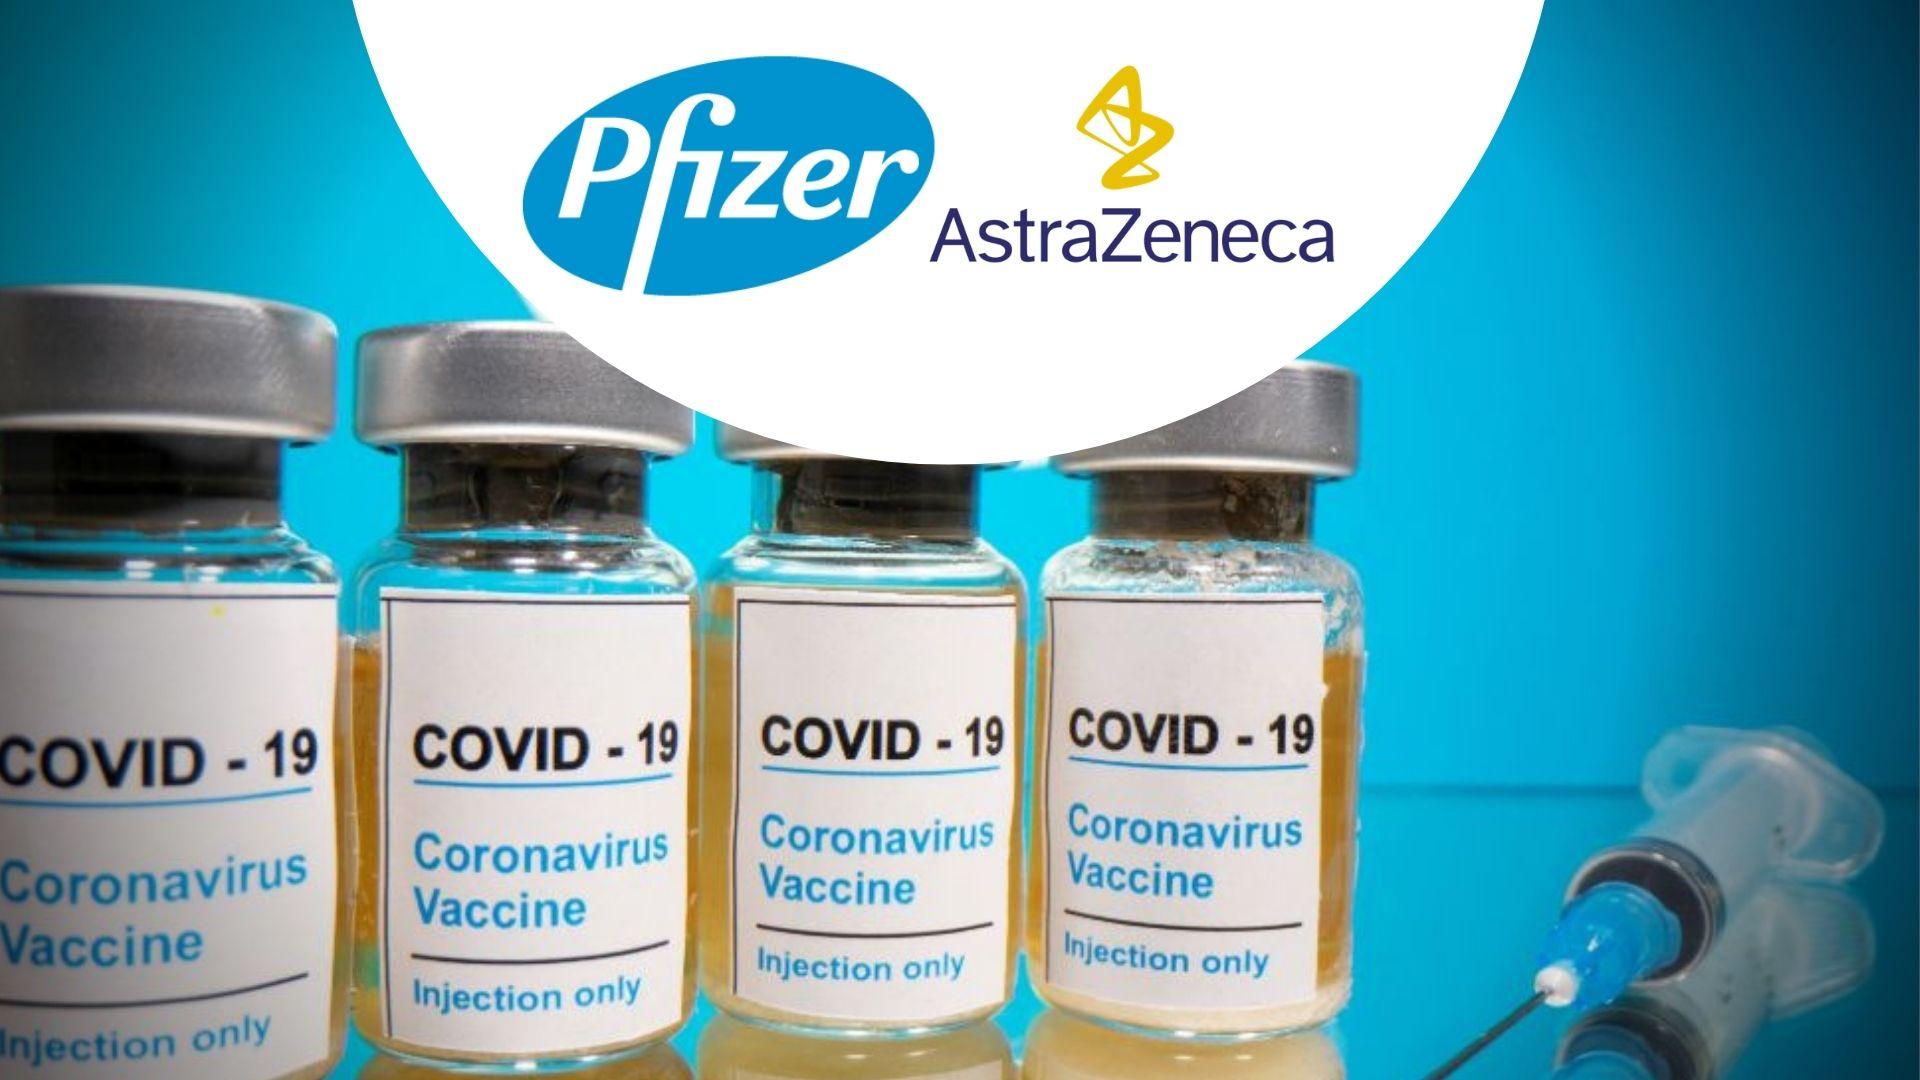 pfizer astrazeneca vacuna segona dosi